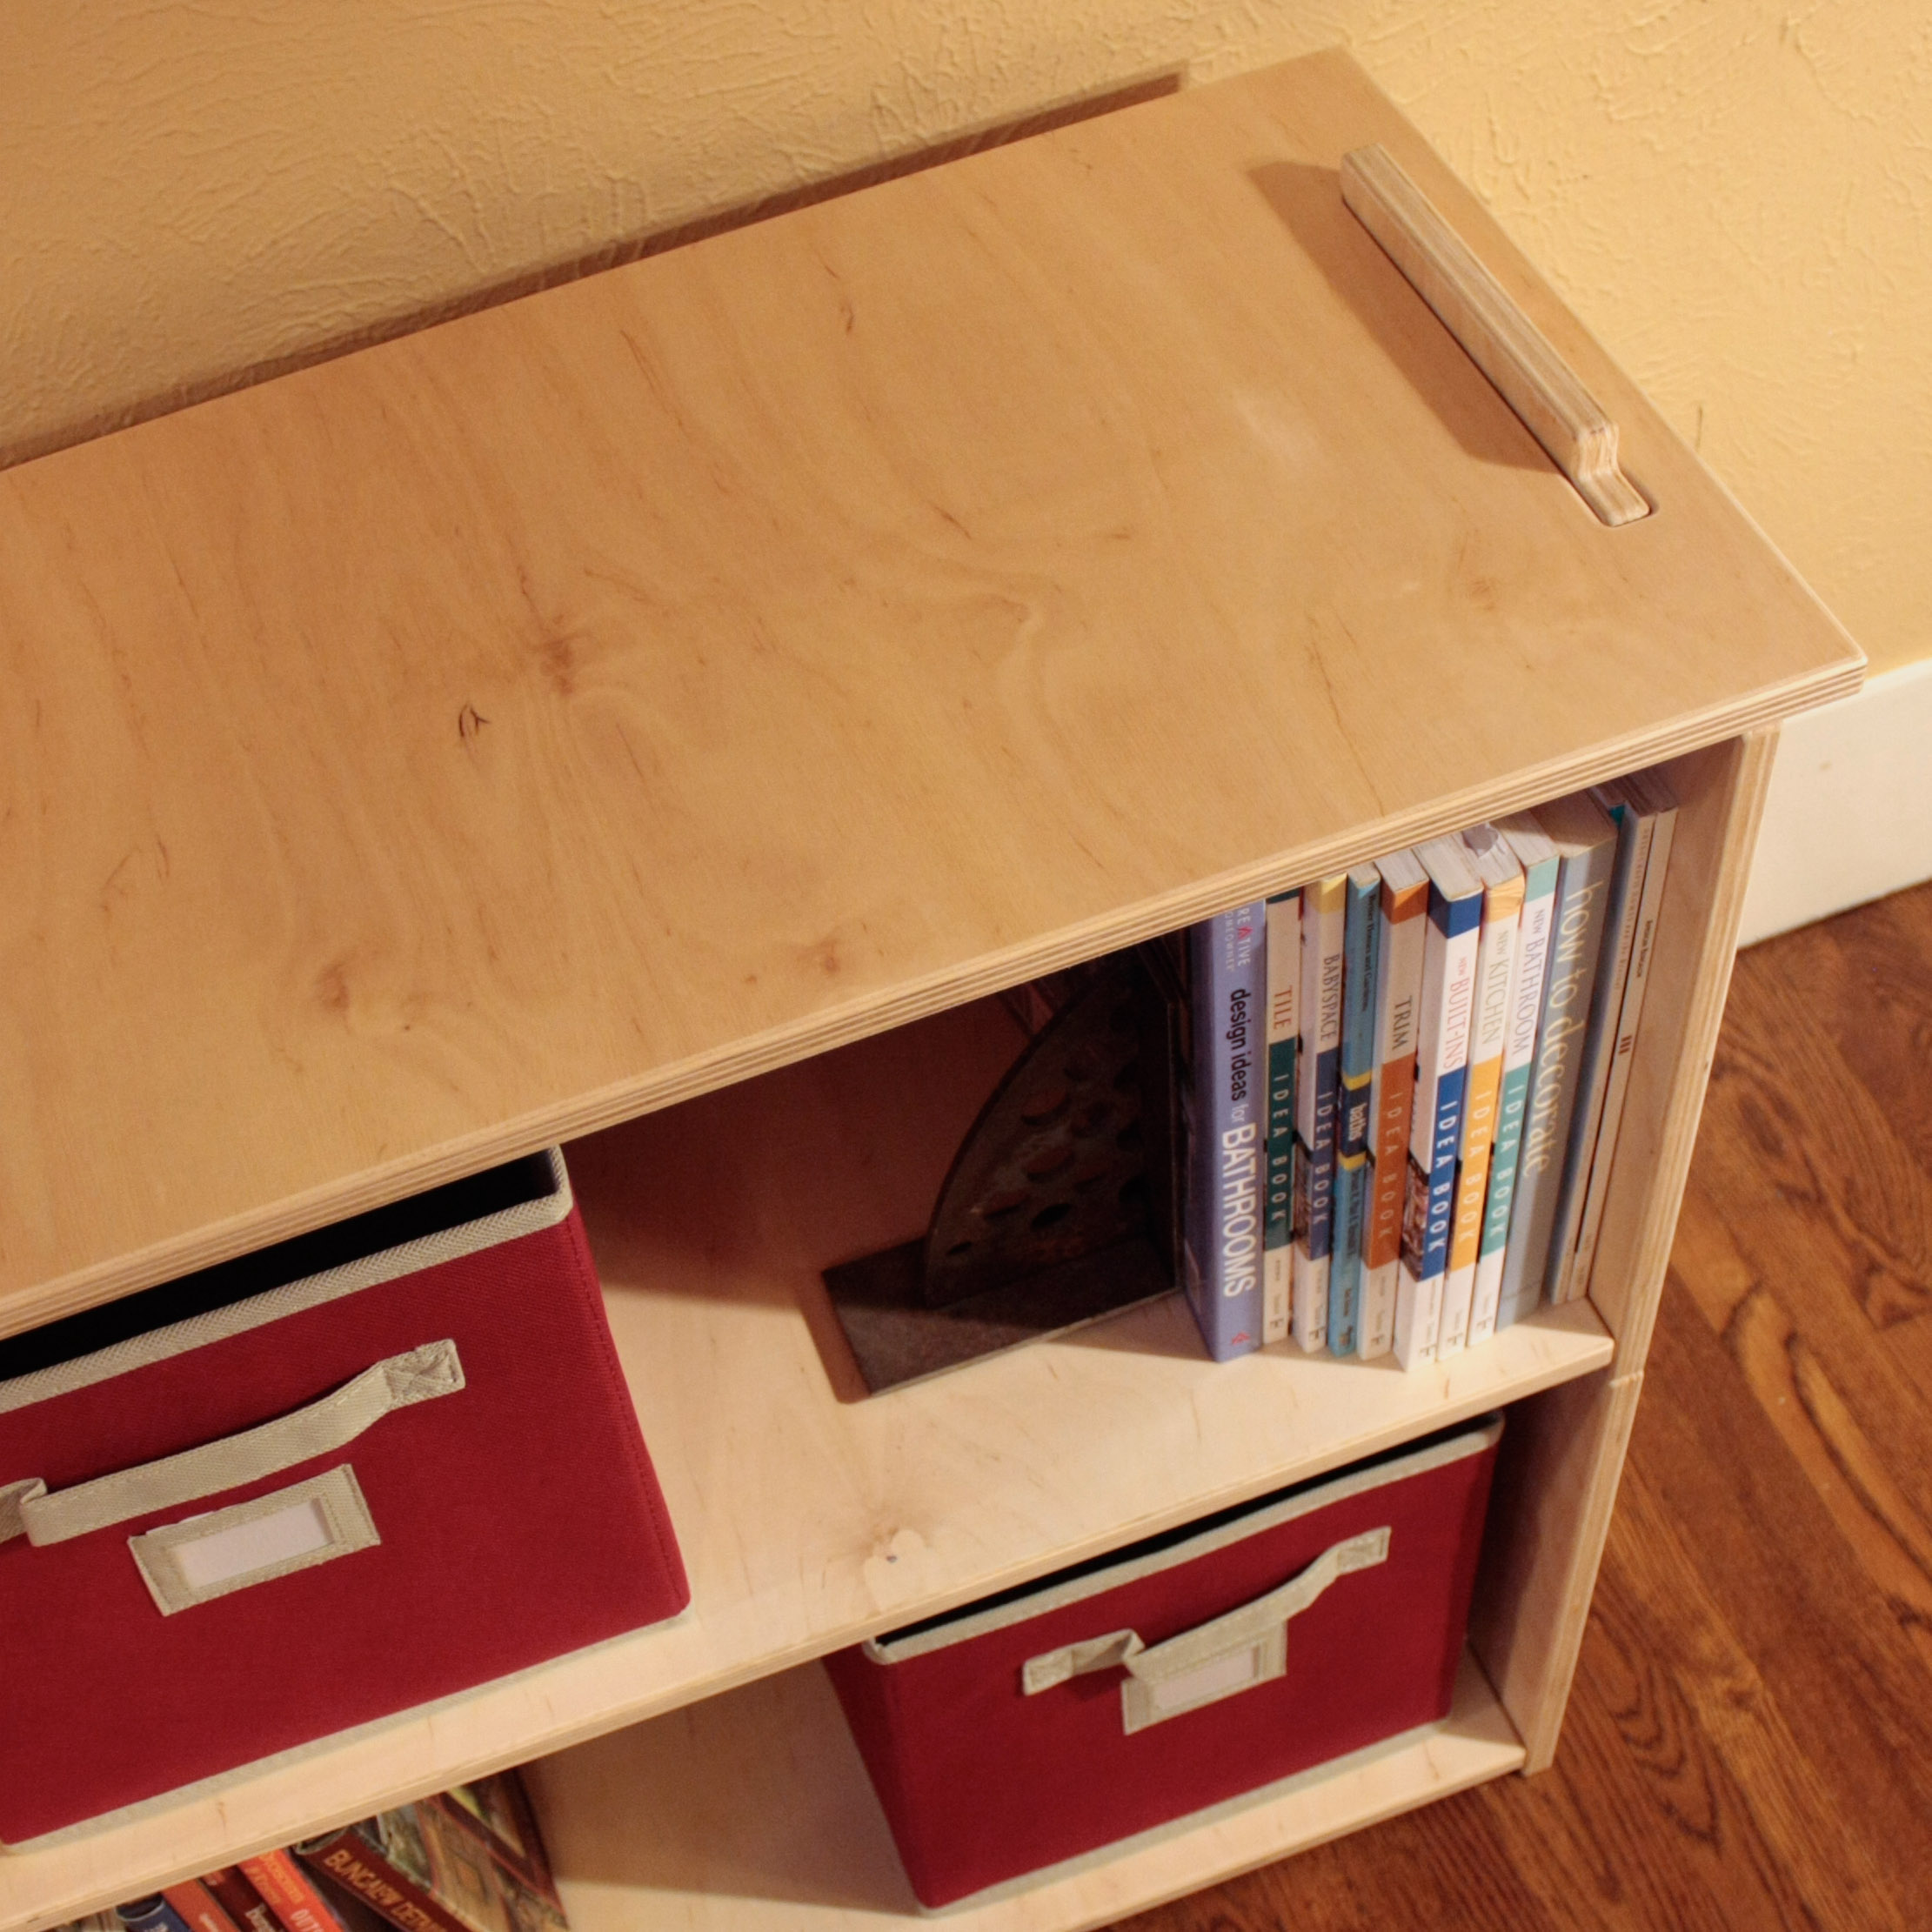 Stacking Shelves -